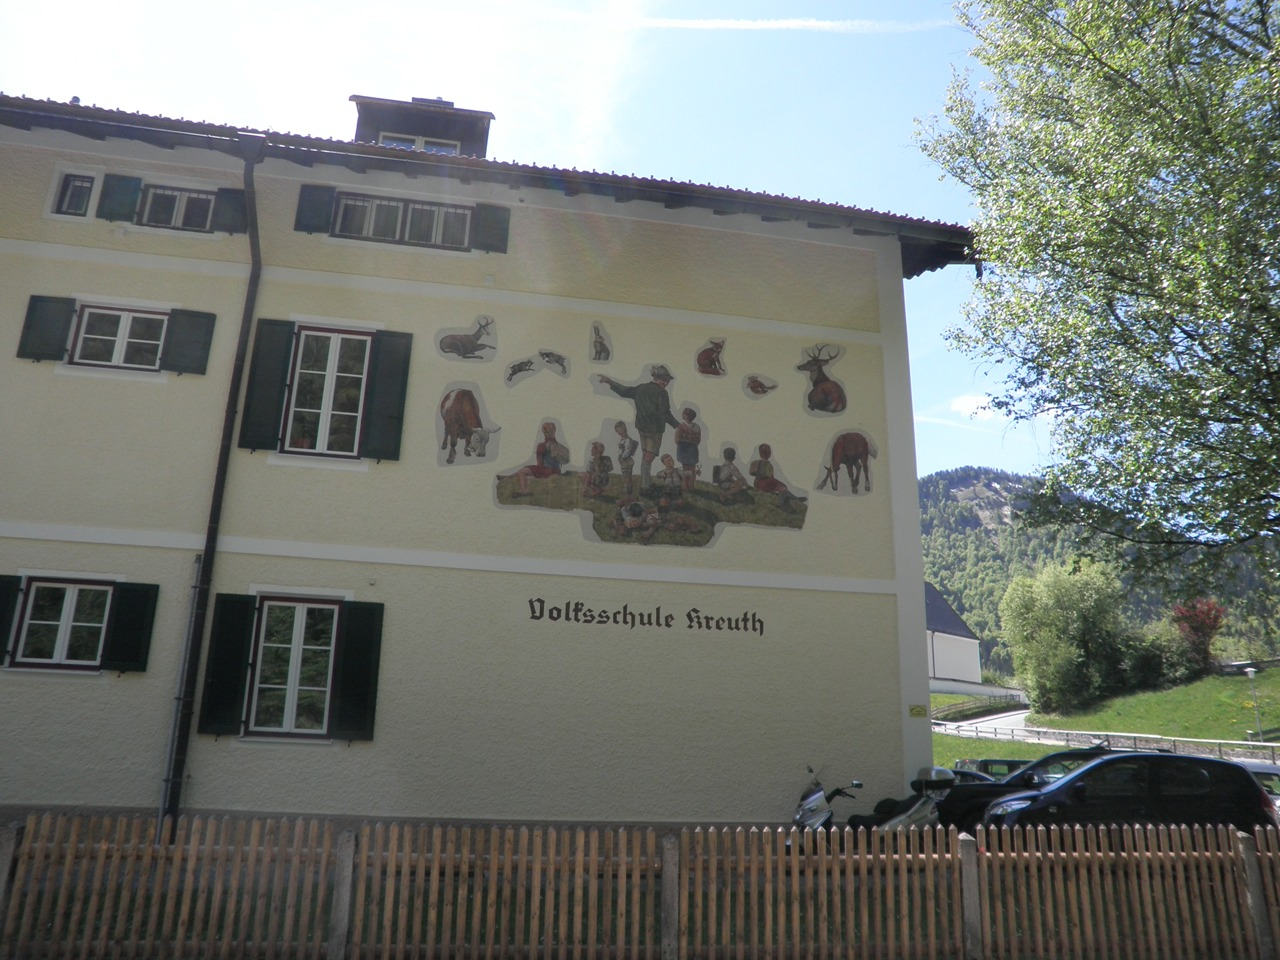 Fußboden Obermeyer Bad Tölz ~ Volksschule kreuth gästehaus winkler